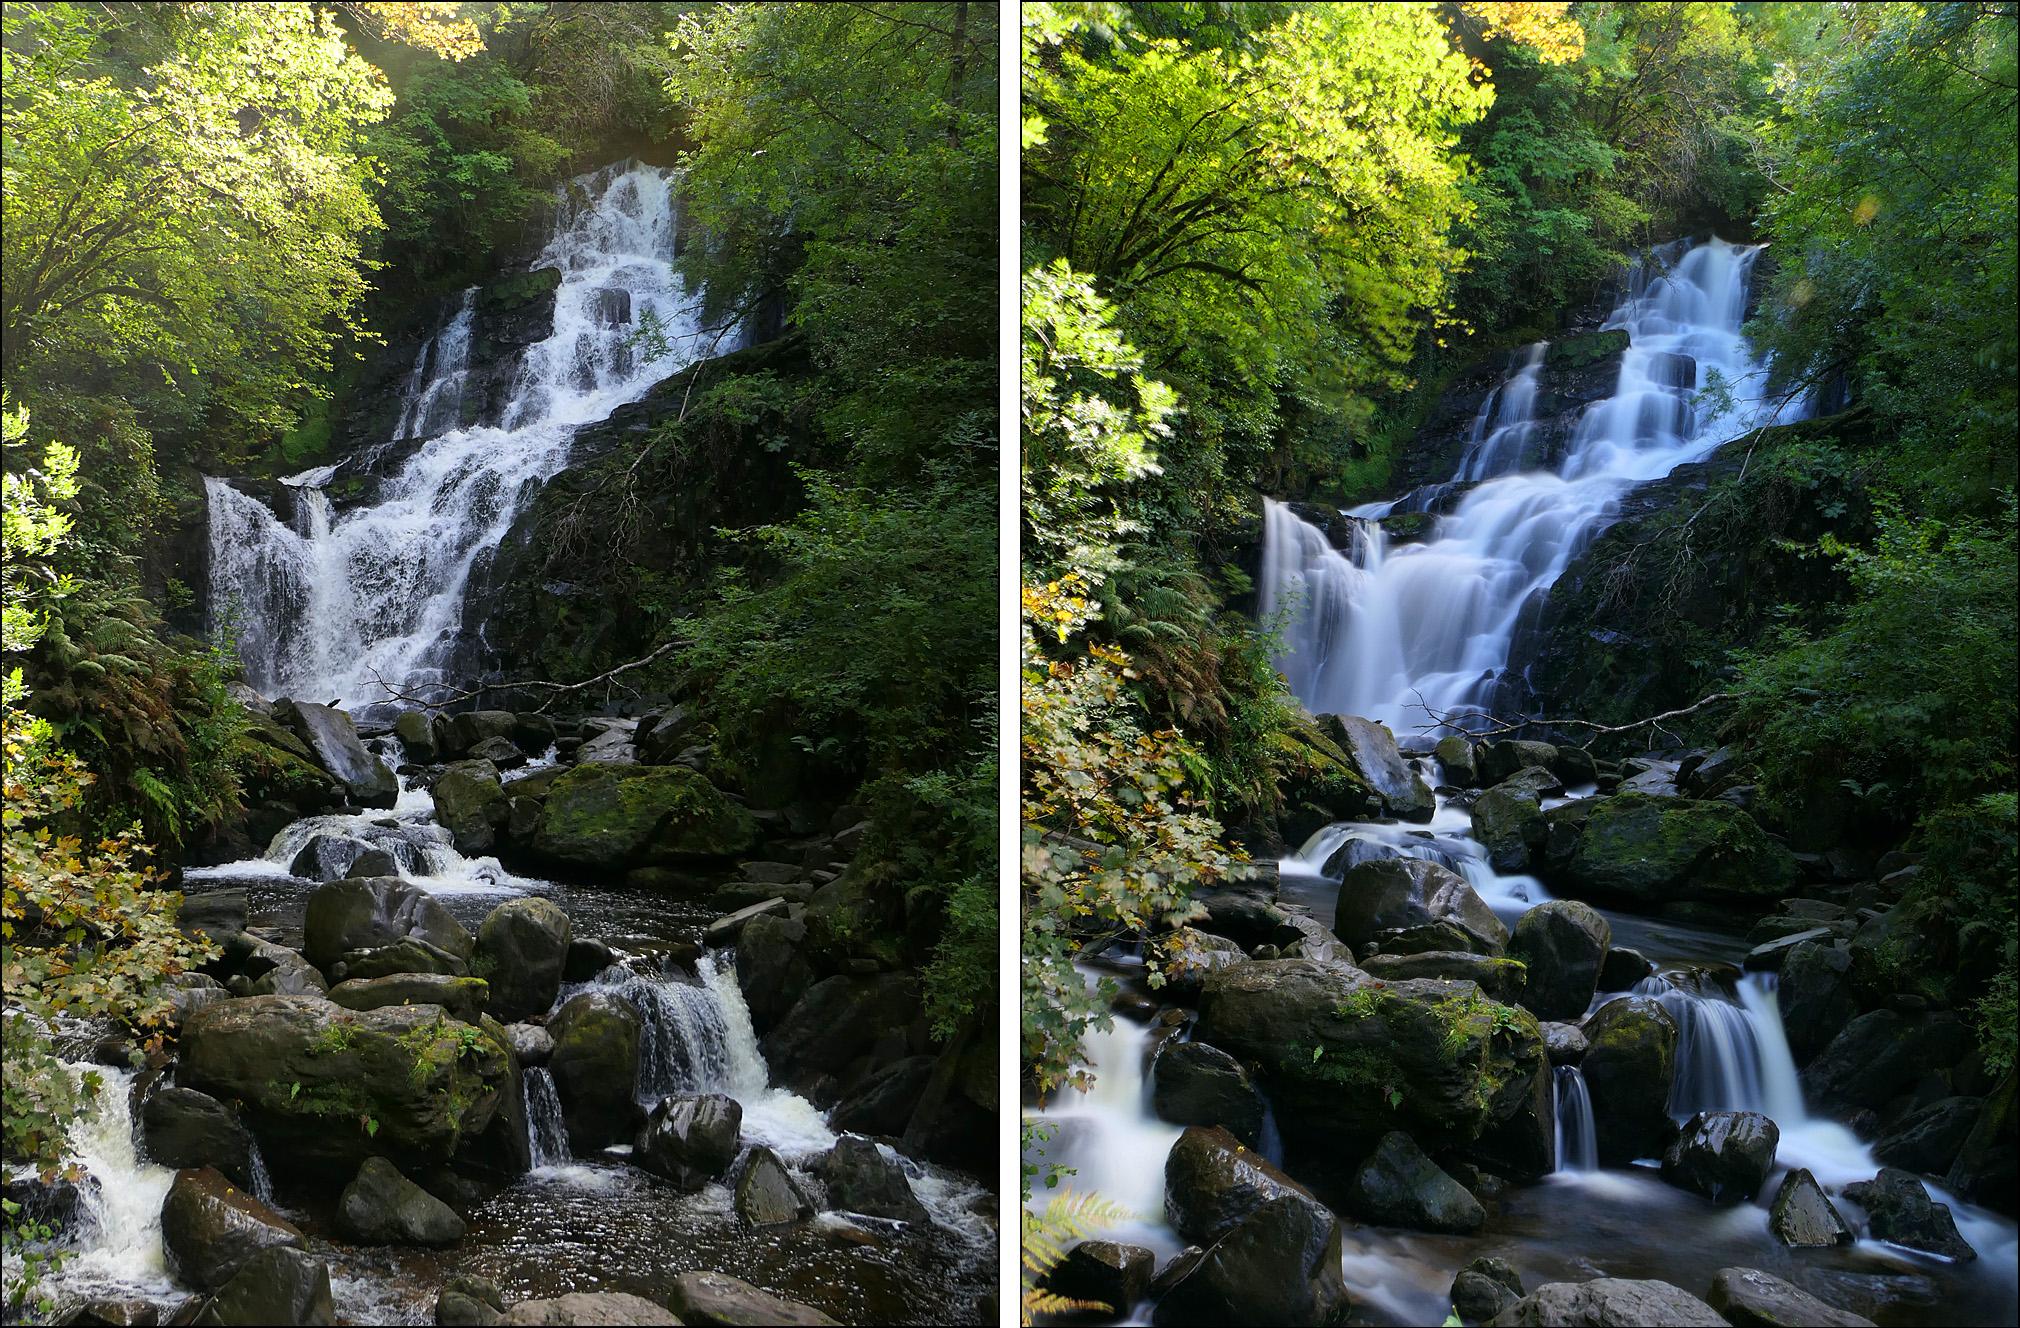 That velvety water effect